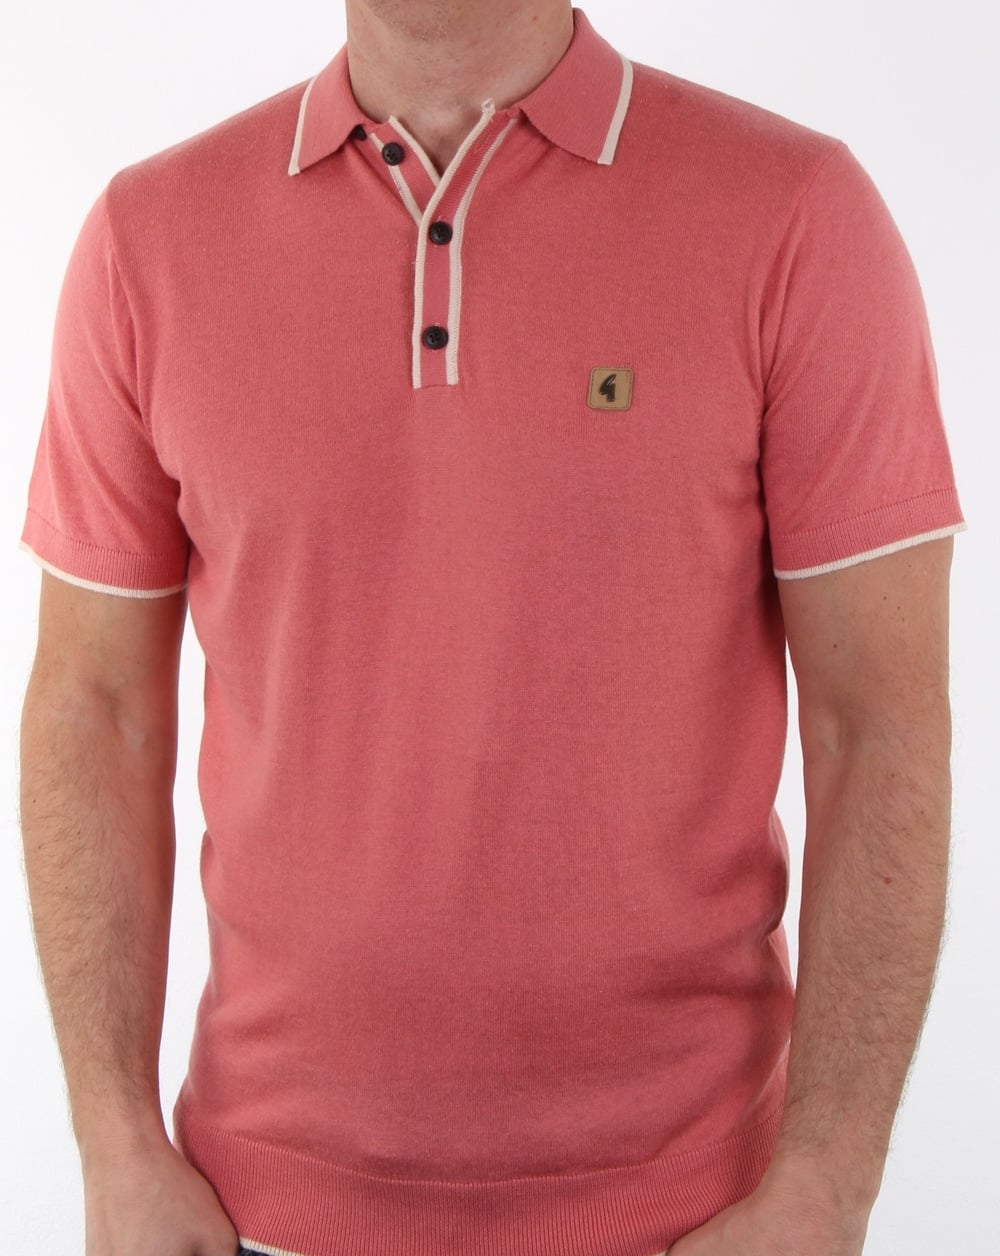 Gabicci Vintage Gabicci Vintage Linekar Knitted Polo Shirt Pink 9b01c7371079